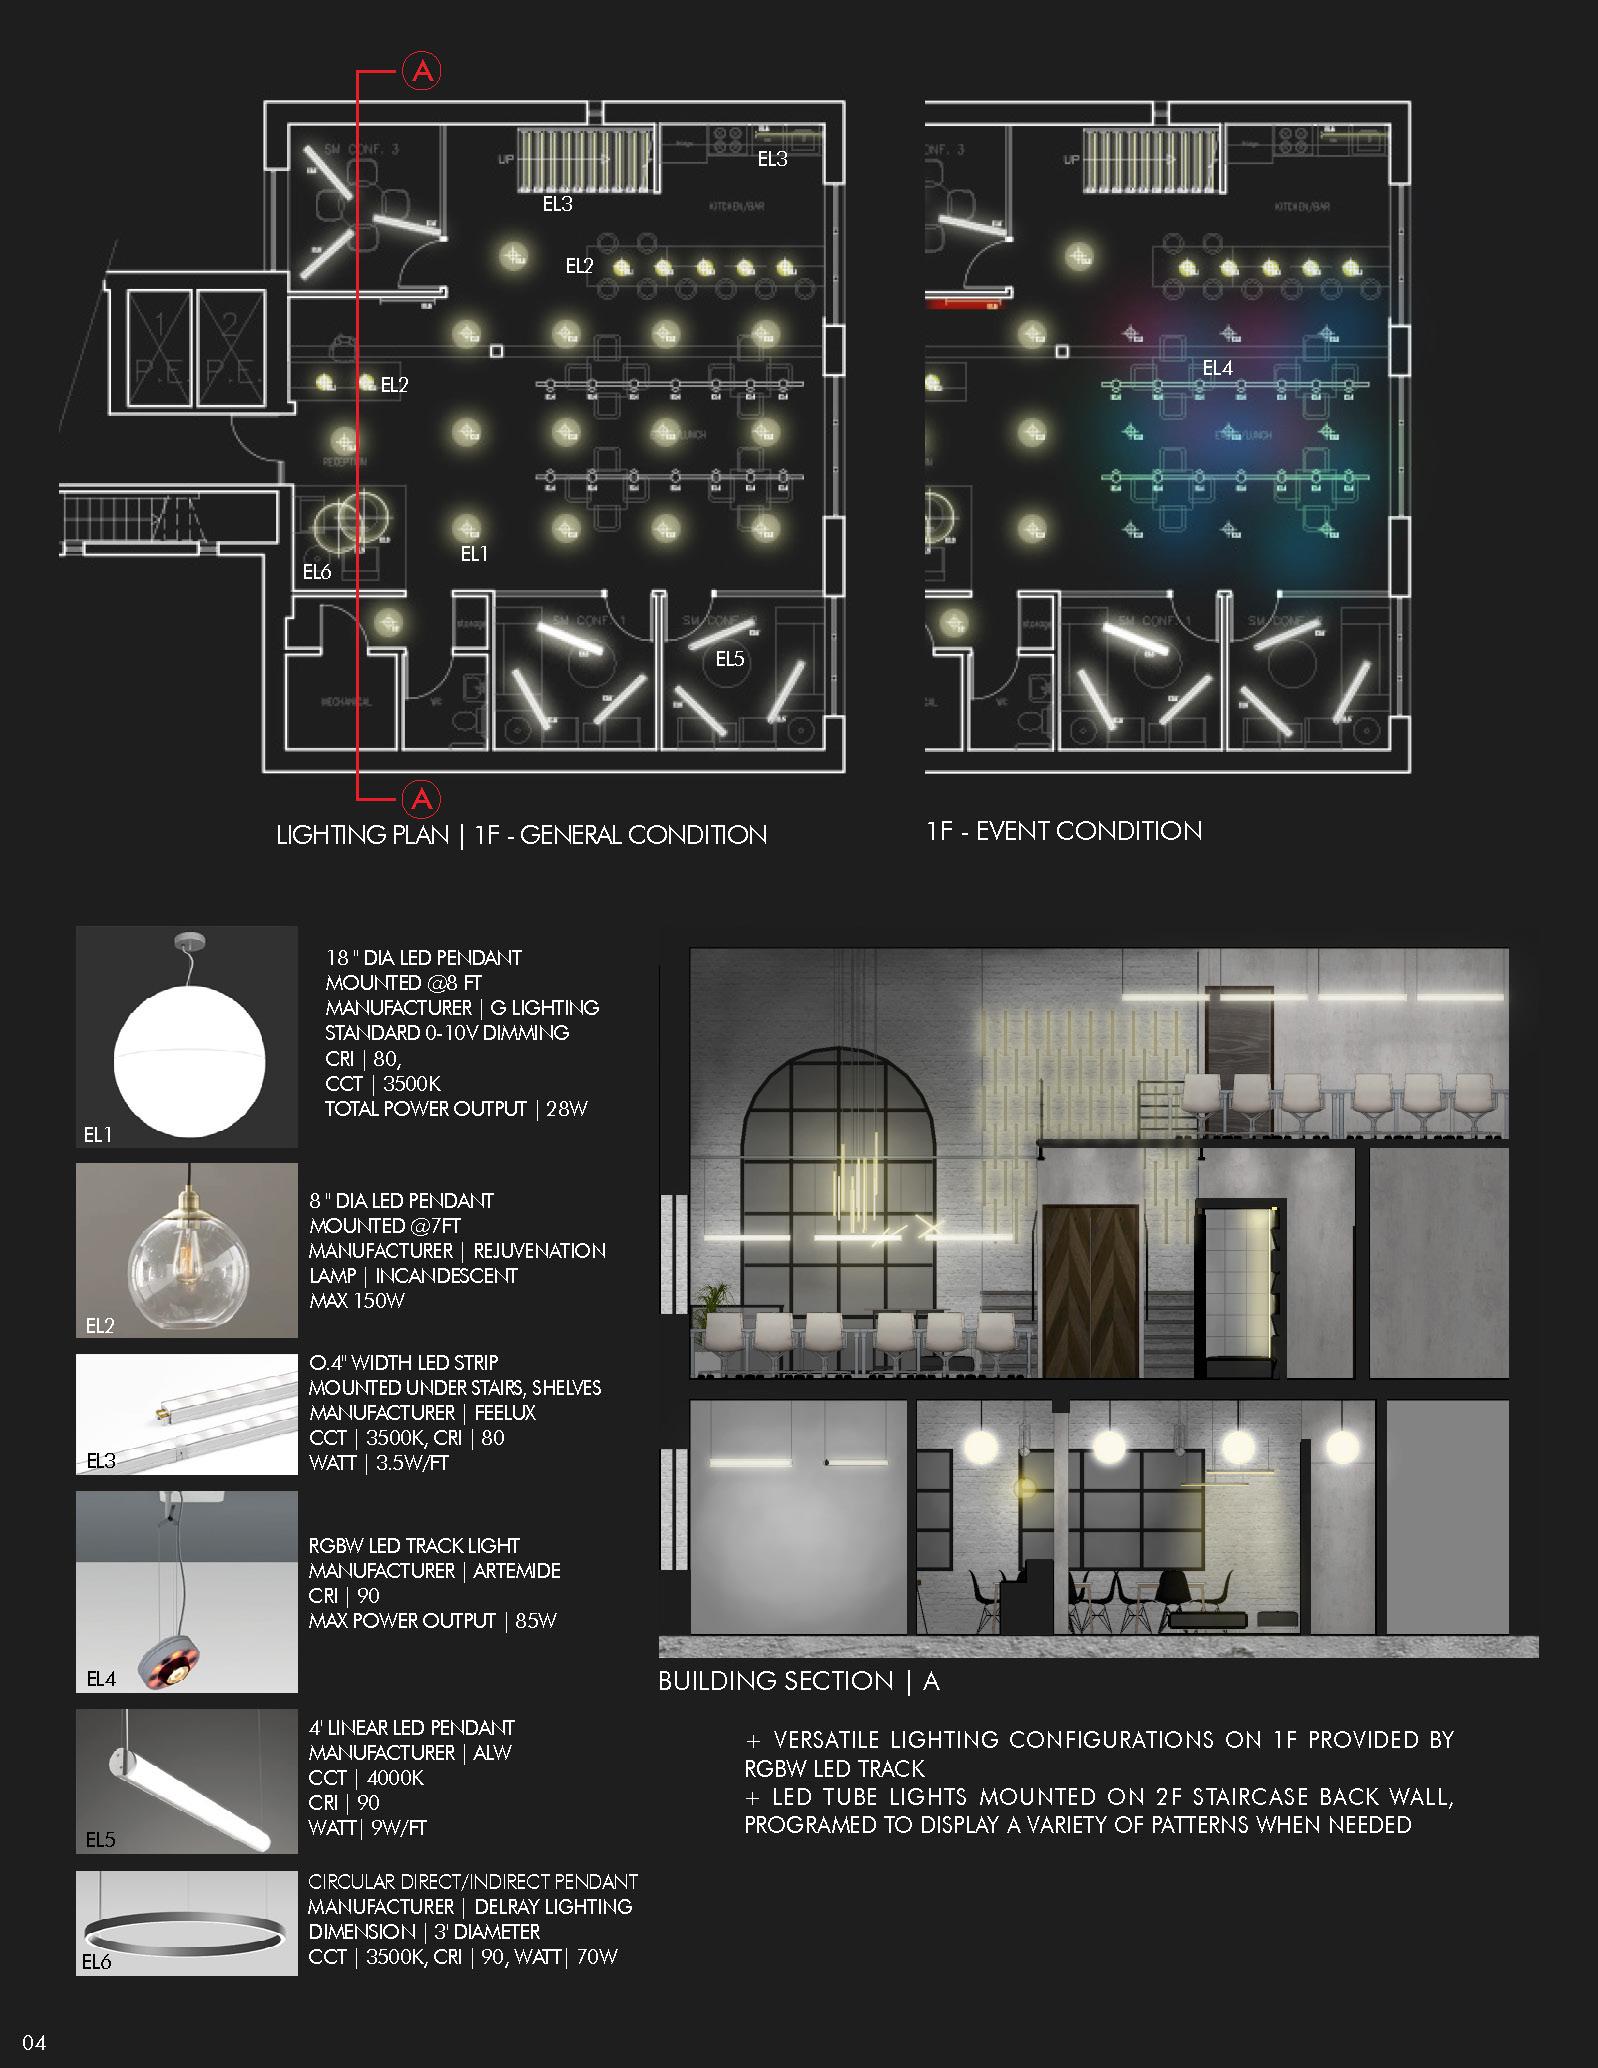 Tinder Office Lighting Design Pei